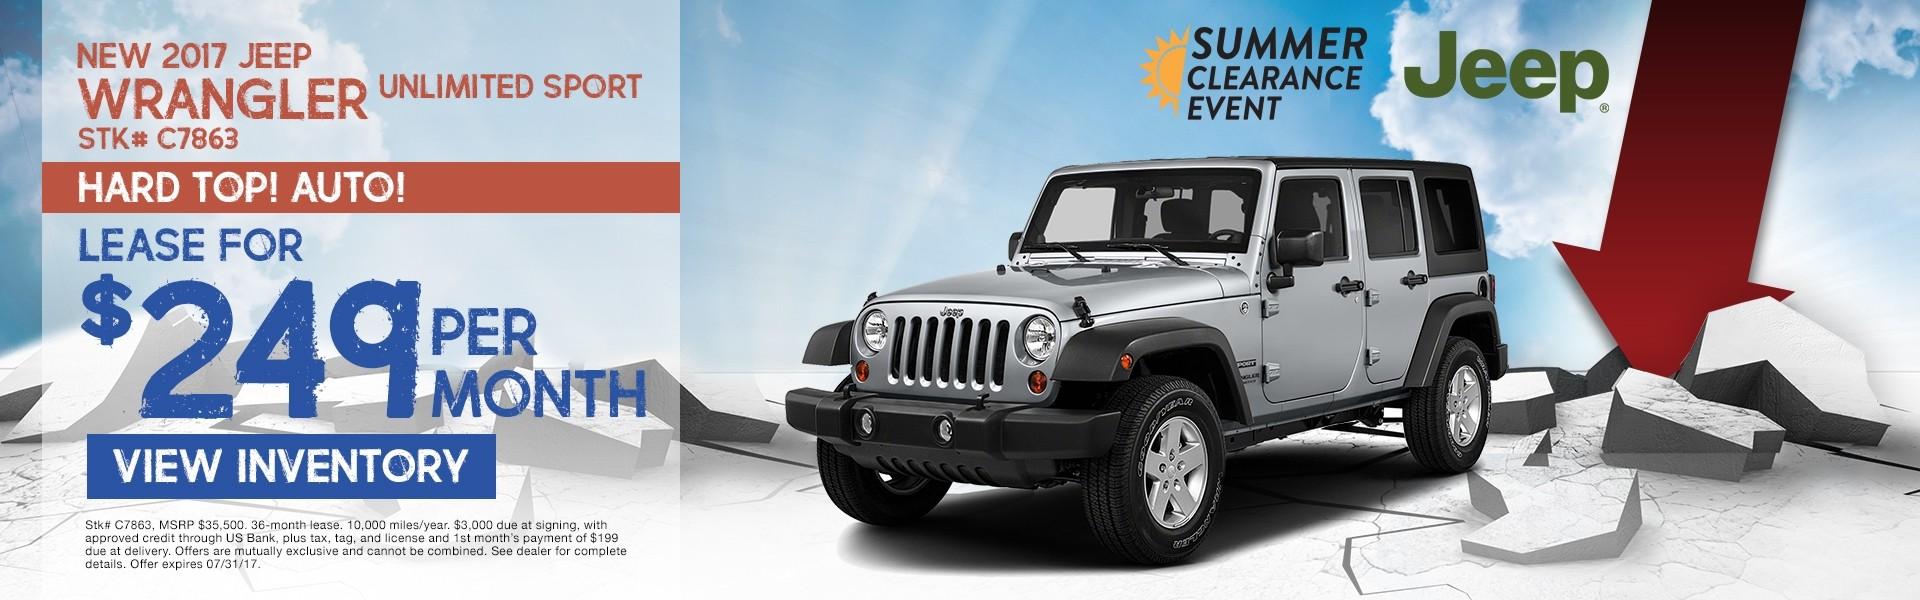 2017 Jeep Wrangler Unlimited Sport. Lease for $249 per month. See dealer for details.